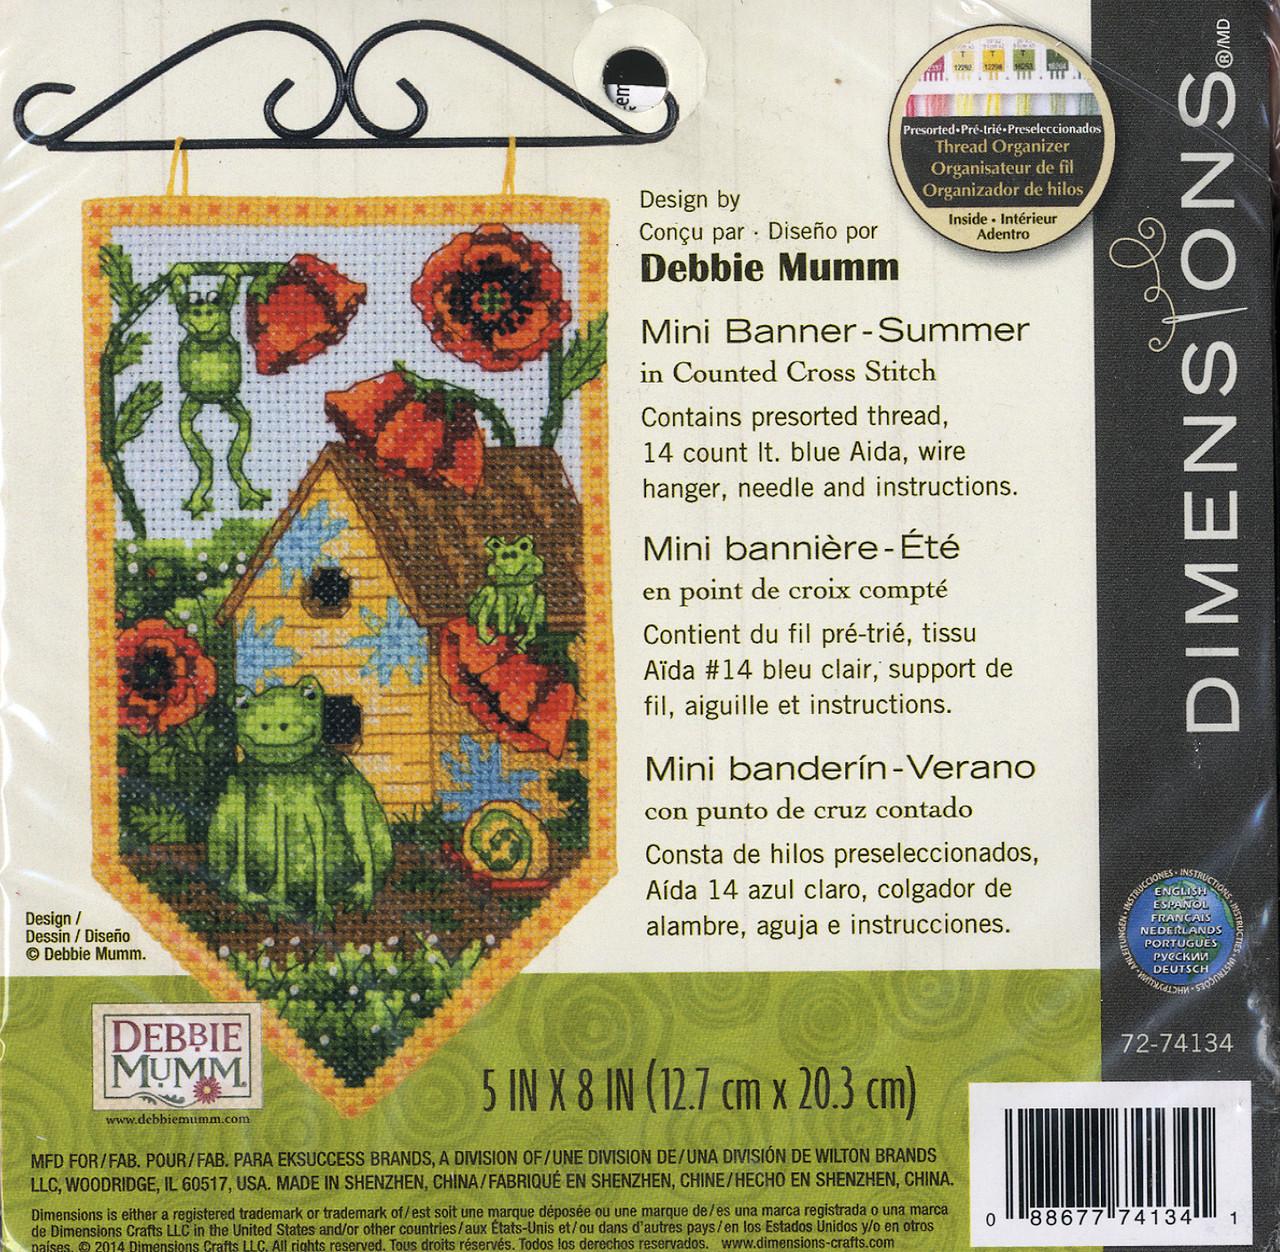 Dimensions / Debbie Mumm - Summer Mini Banner